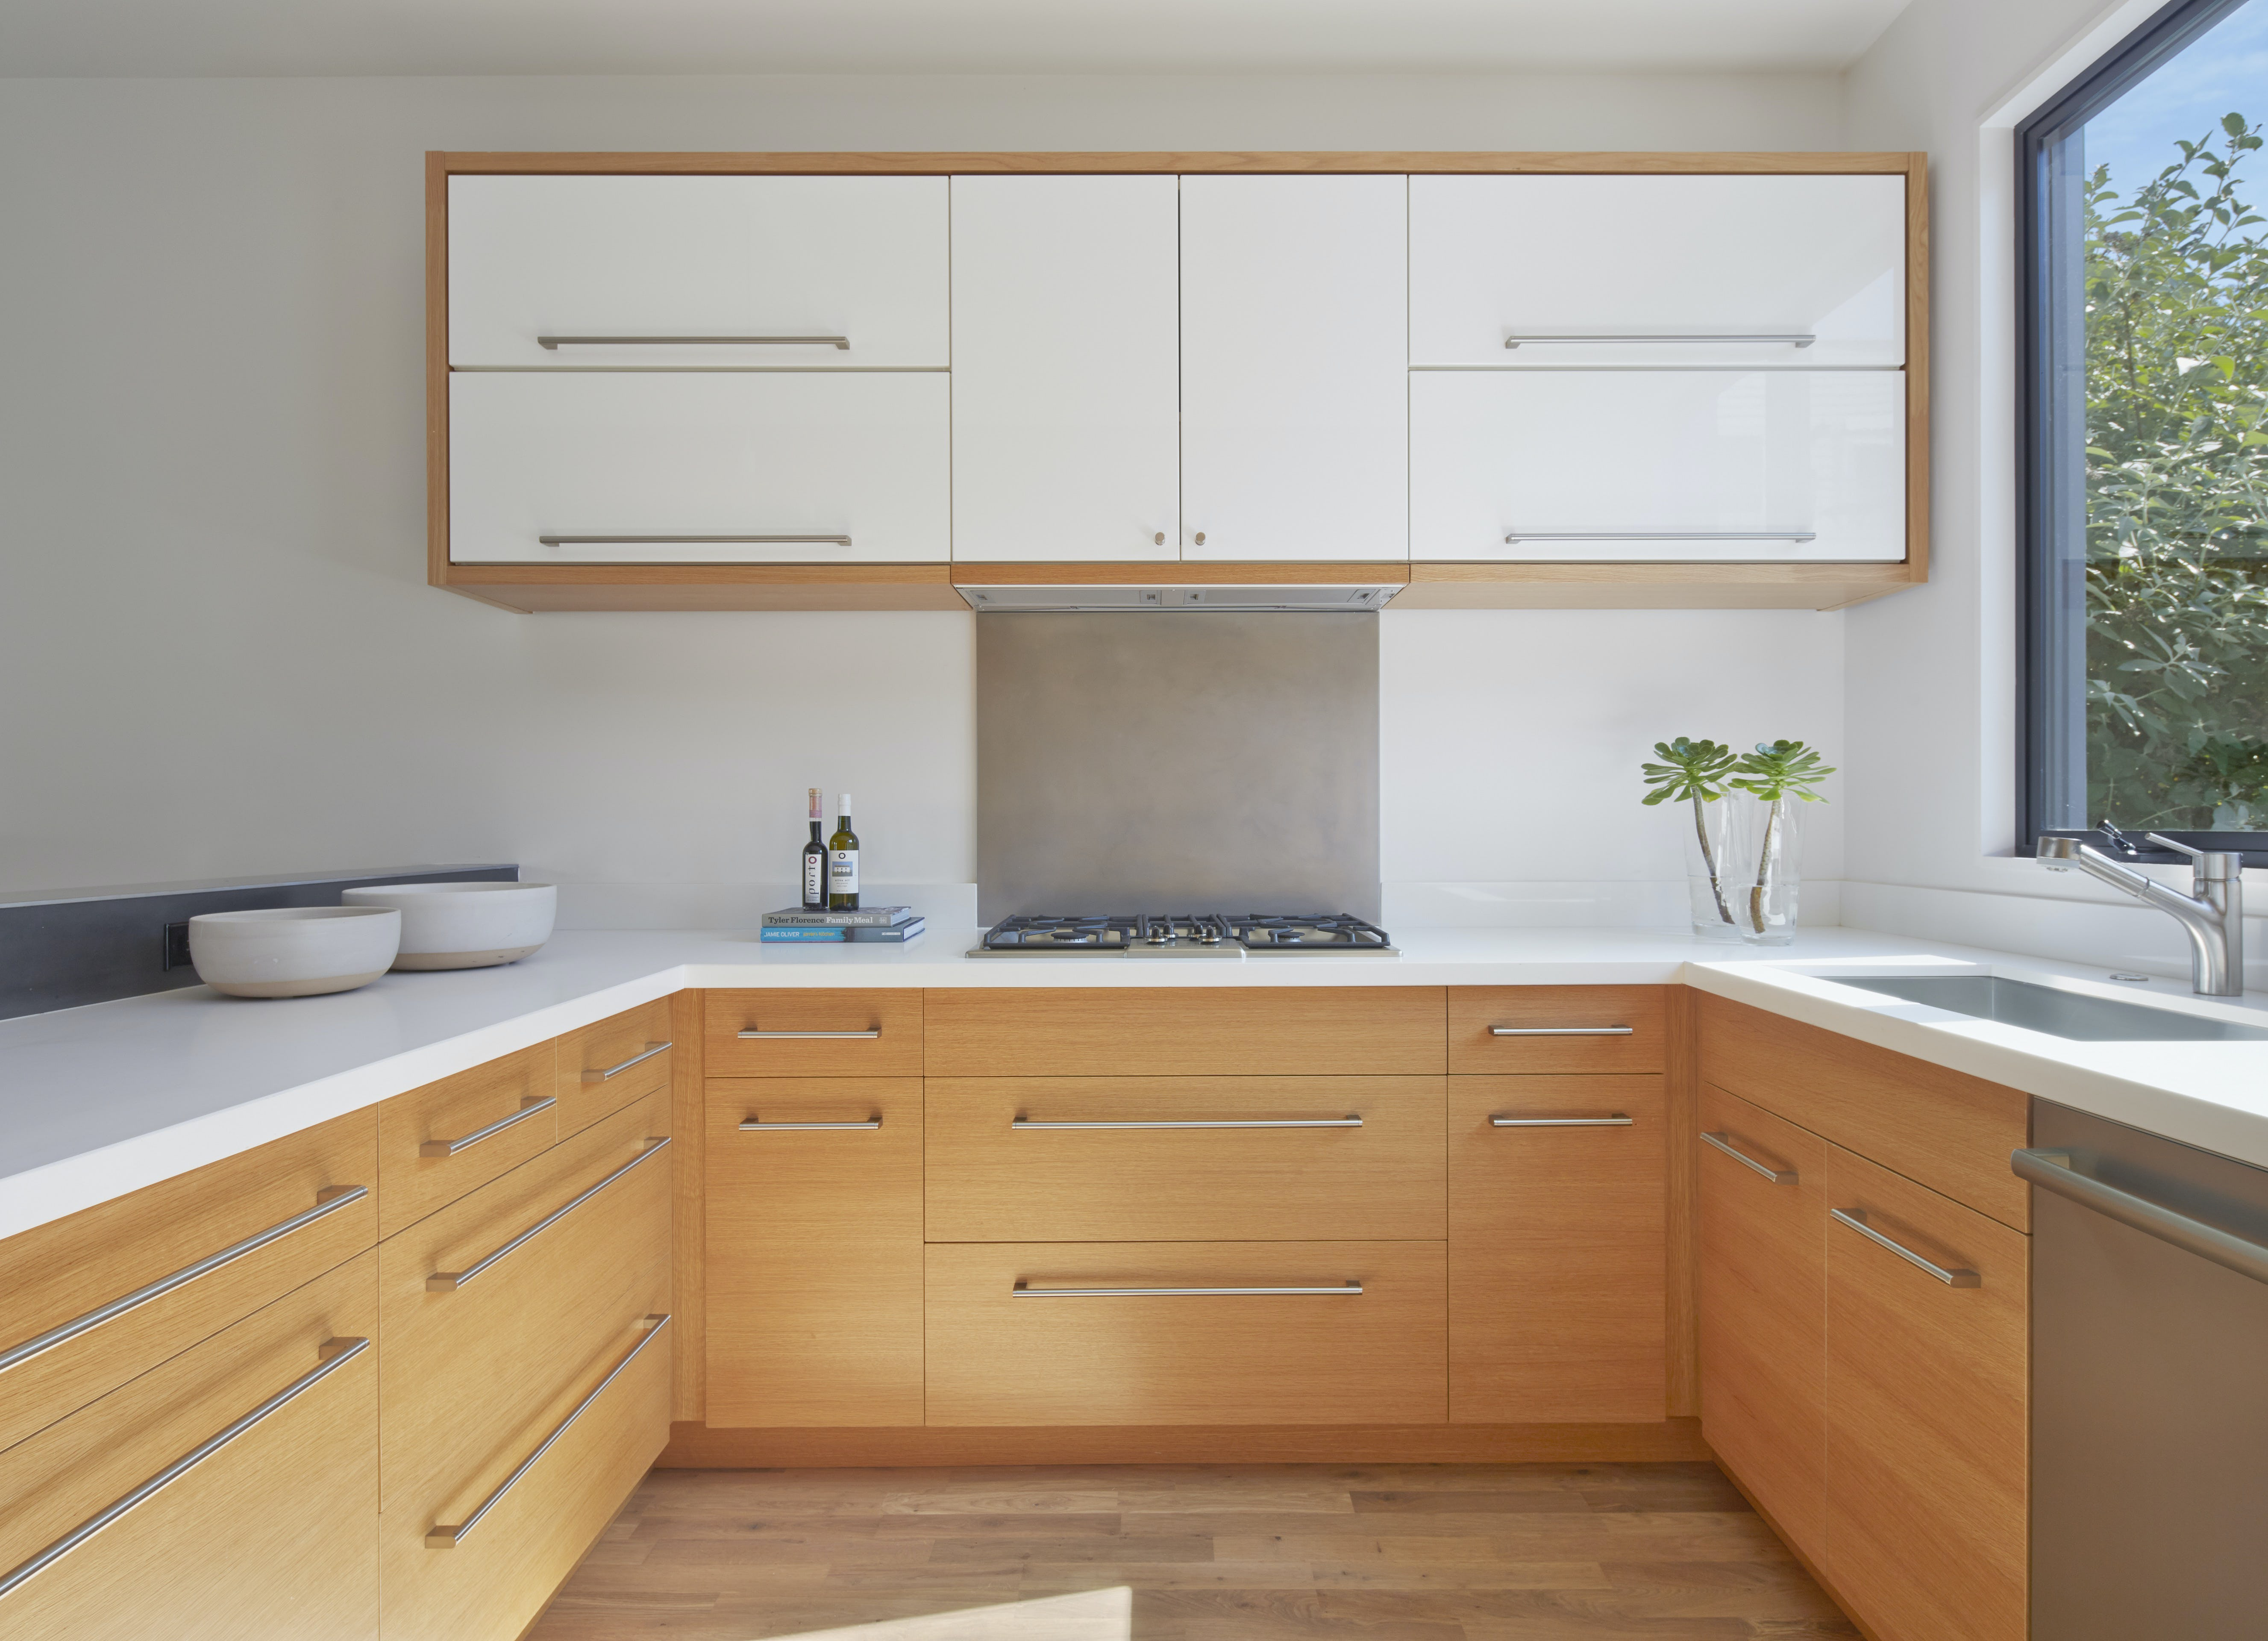 Builtform construction  steelhouse1 2 kitchen wood modern